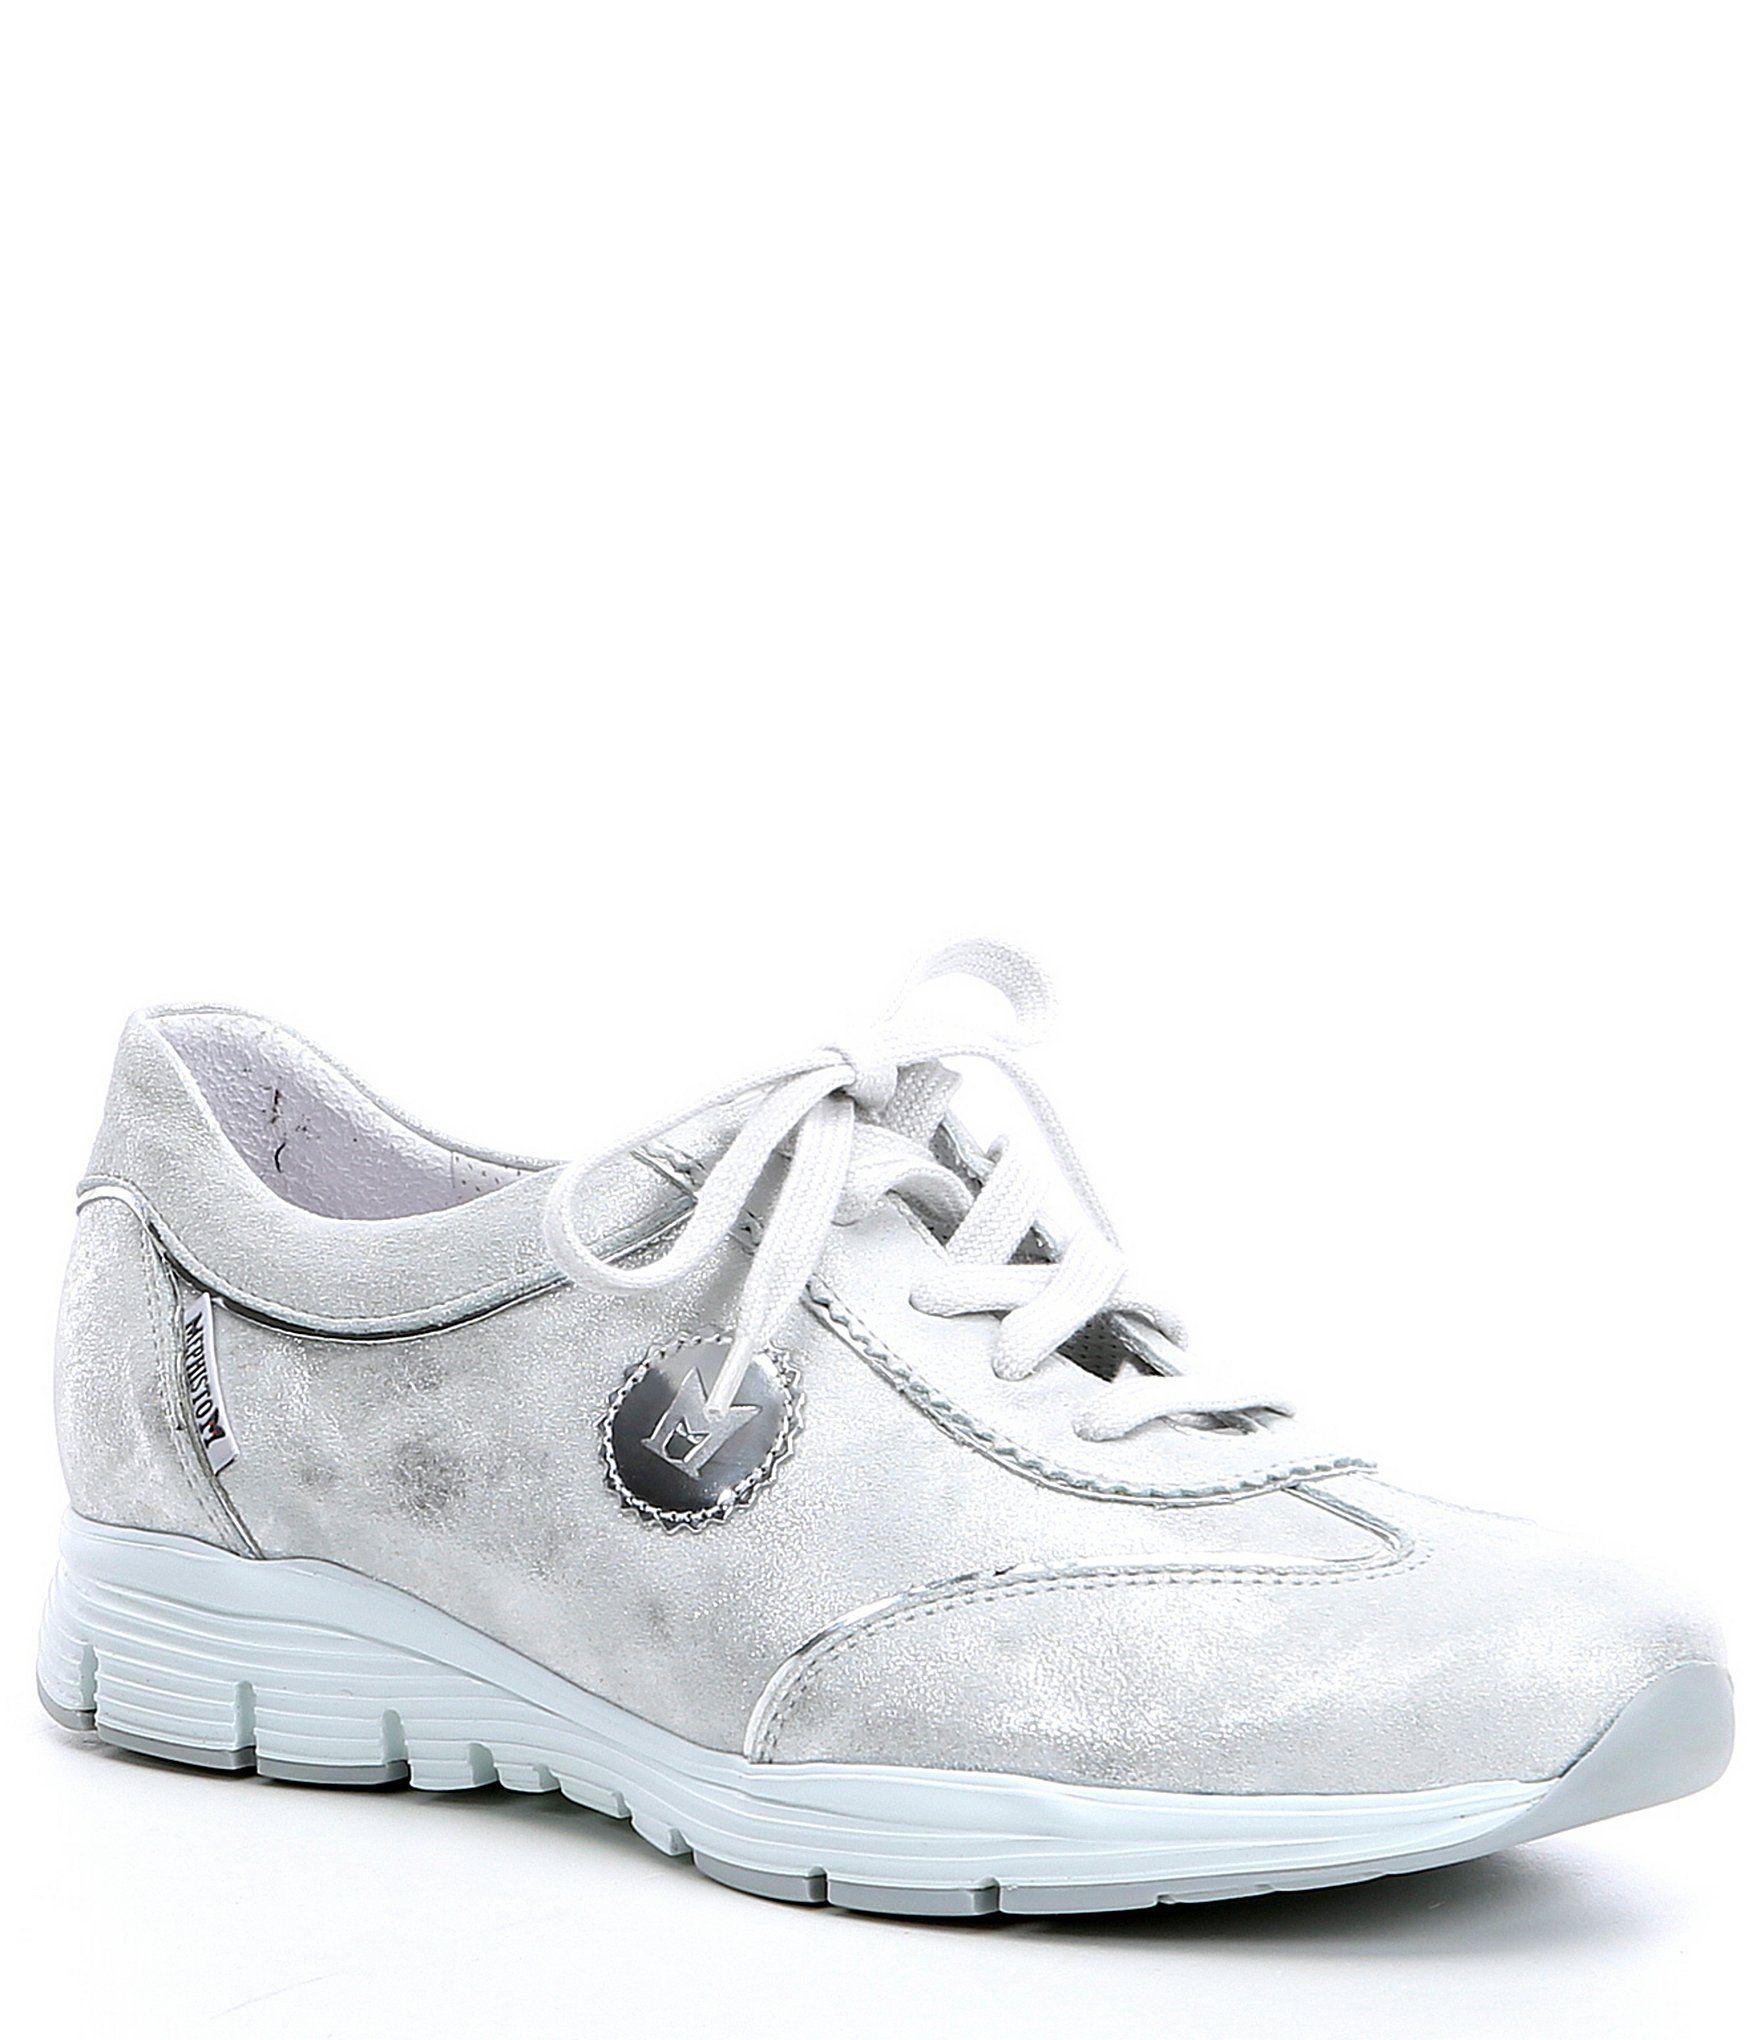 Mephisto Women's Yael Casual Sneakers | Dillard's 5